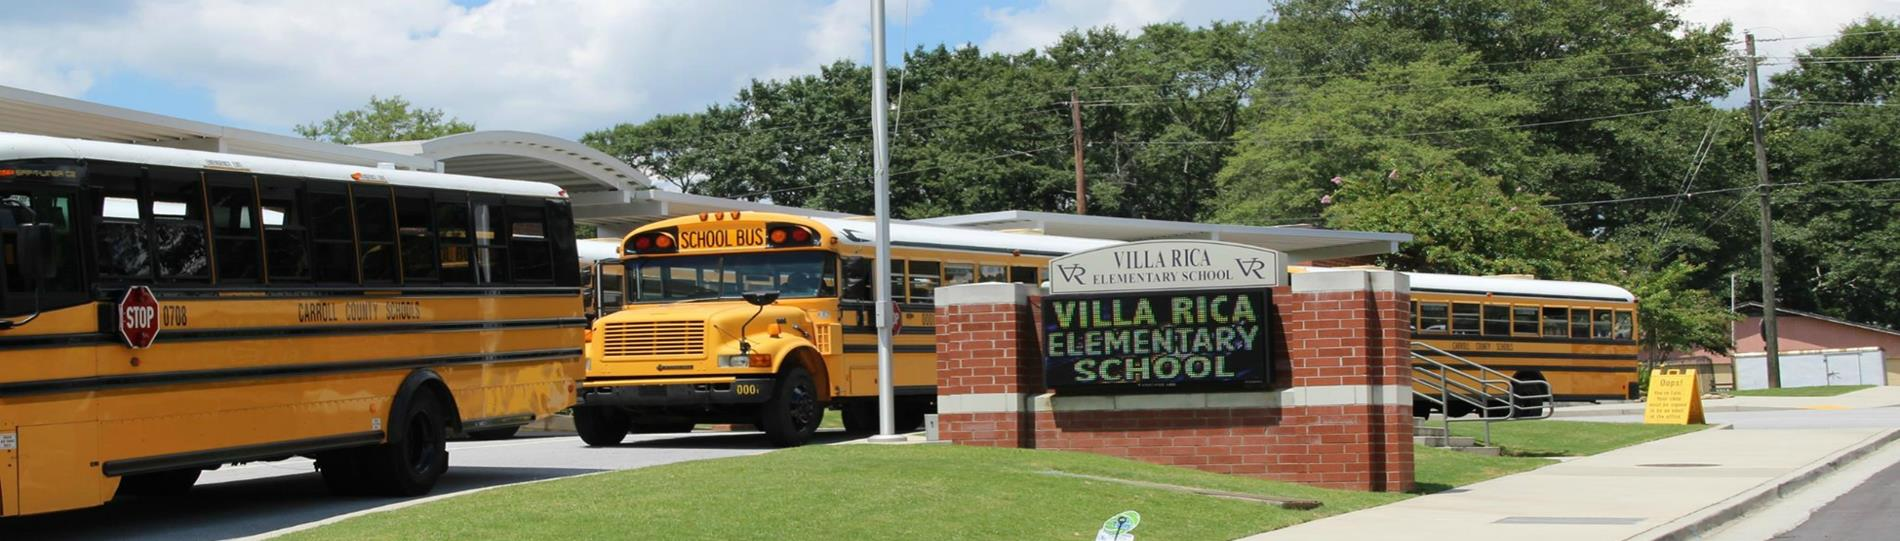 Villa Rica Elementary School